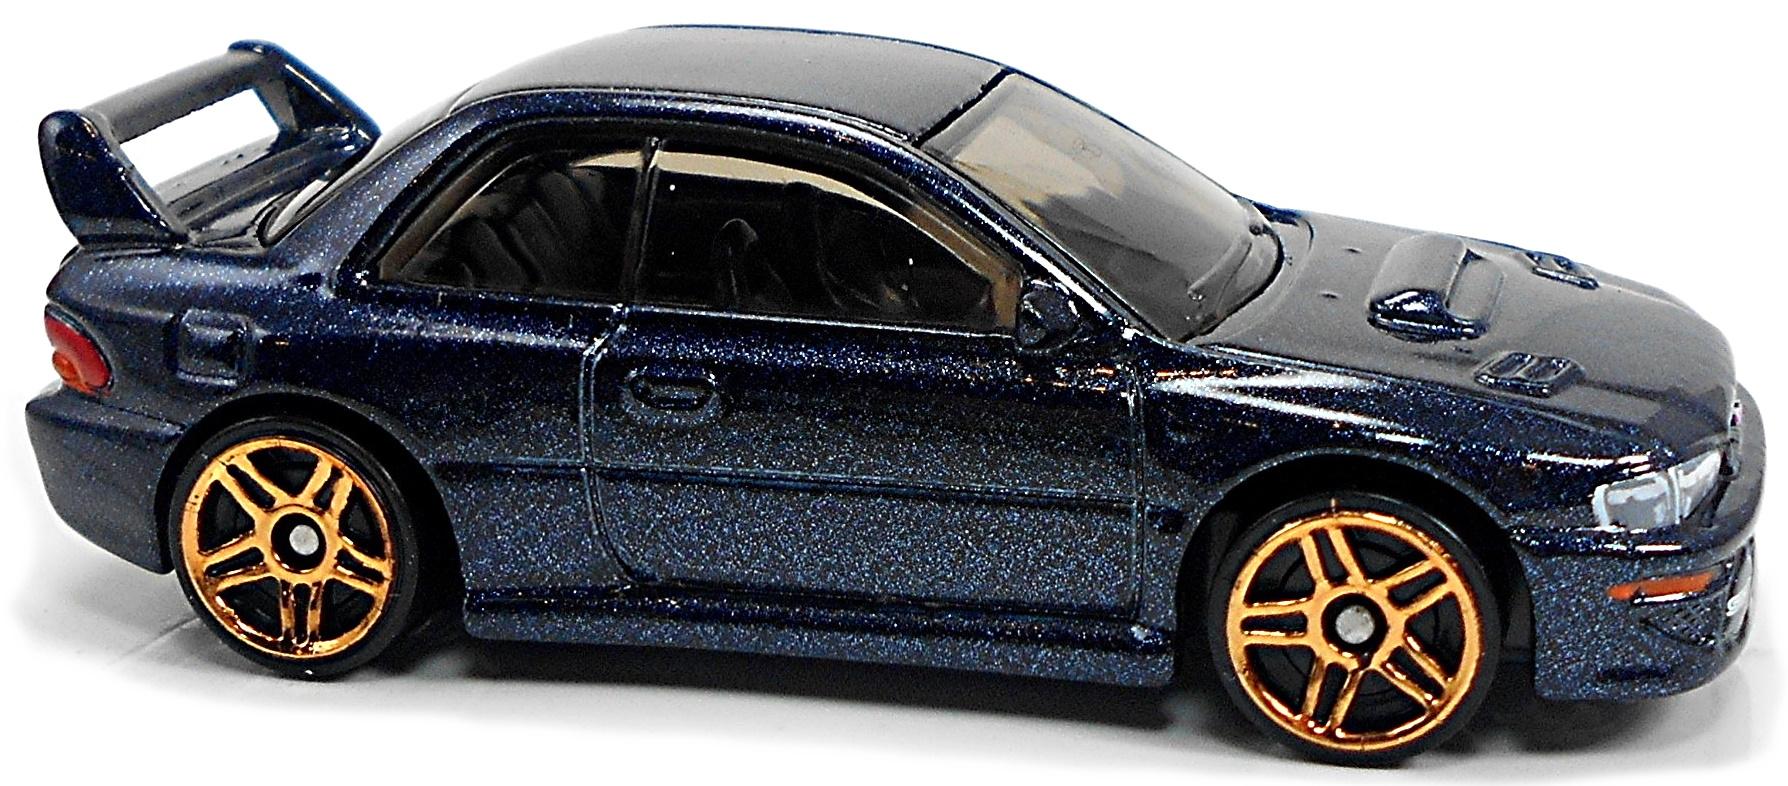 Hot Wheels /'98 Subaru Impreza 22B STI-Version 2020-023 NP18